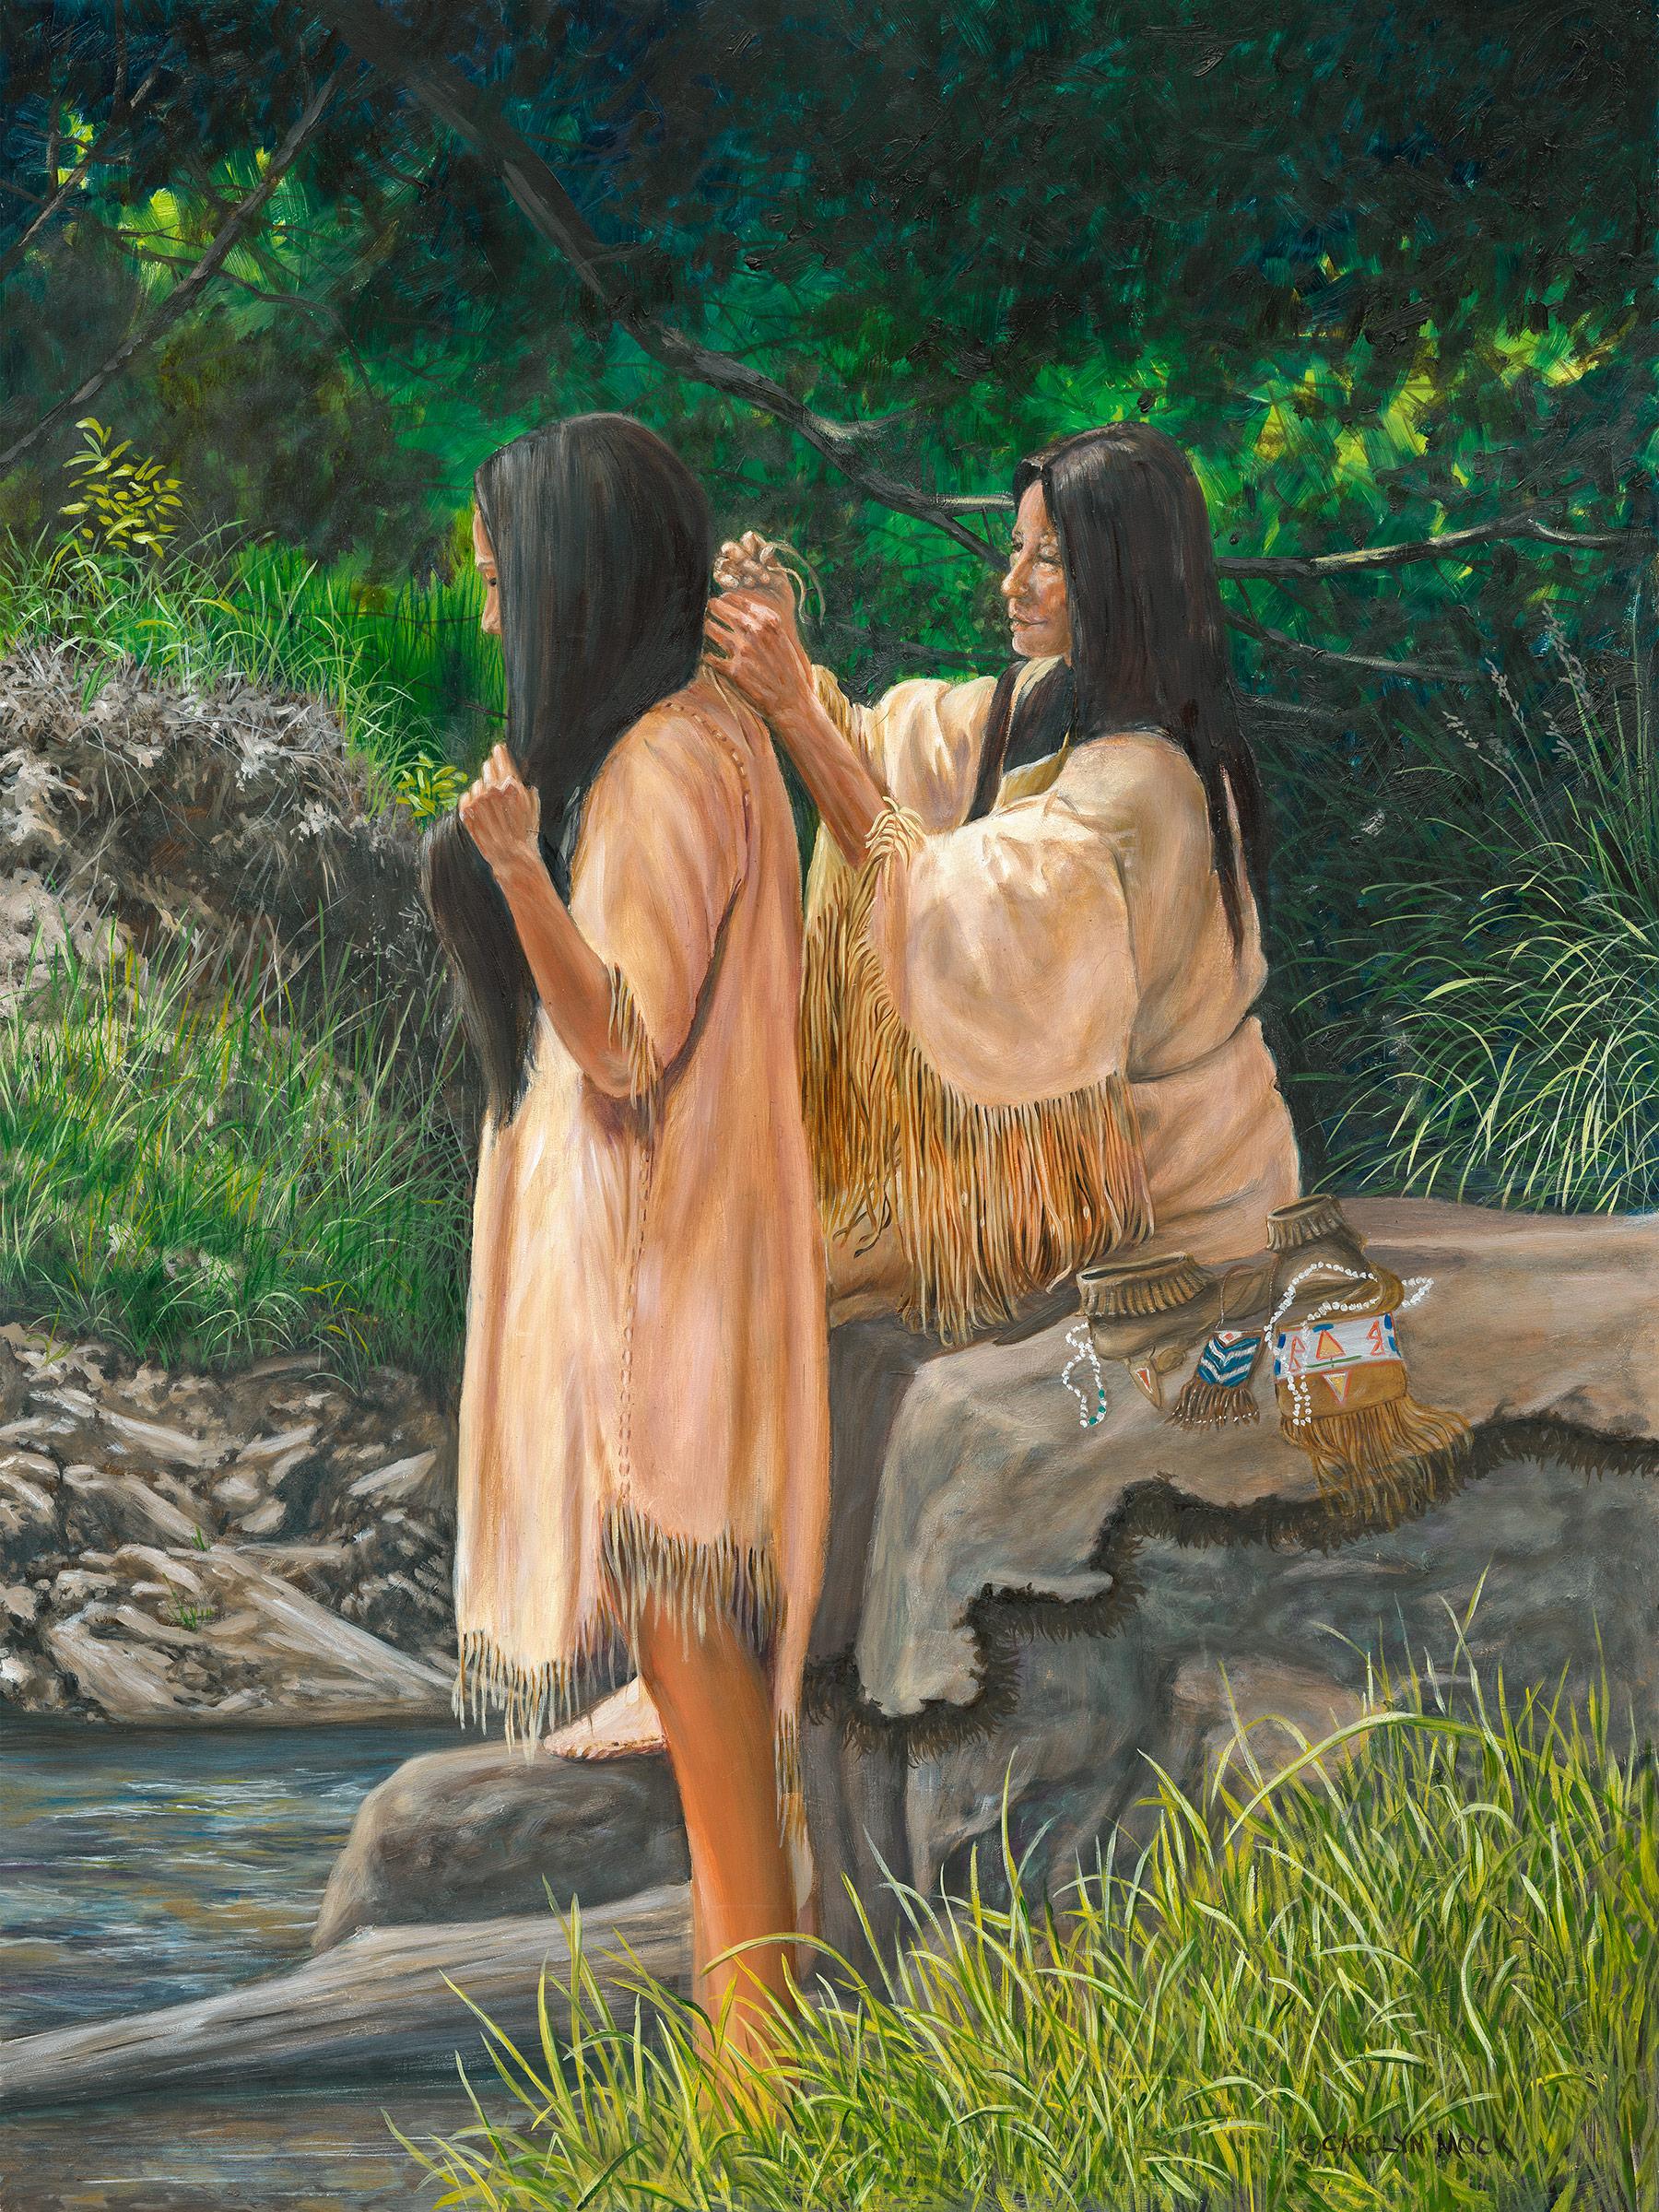 Two Native American women bathe in a stream